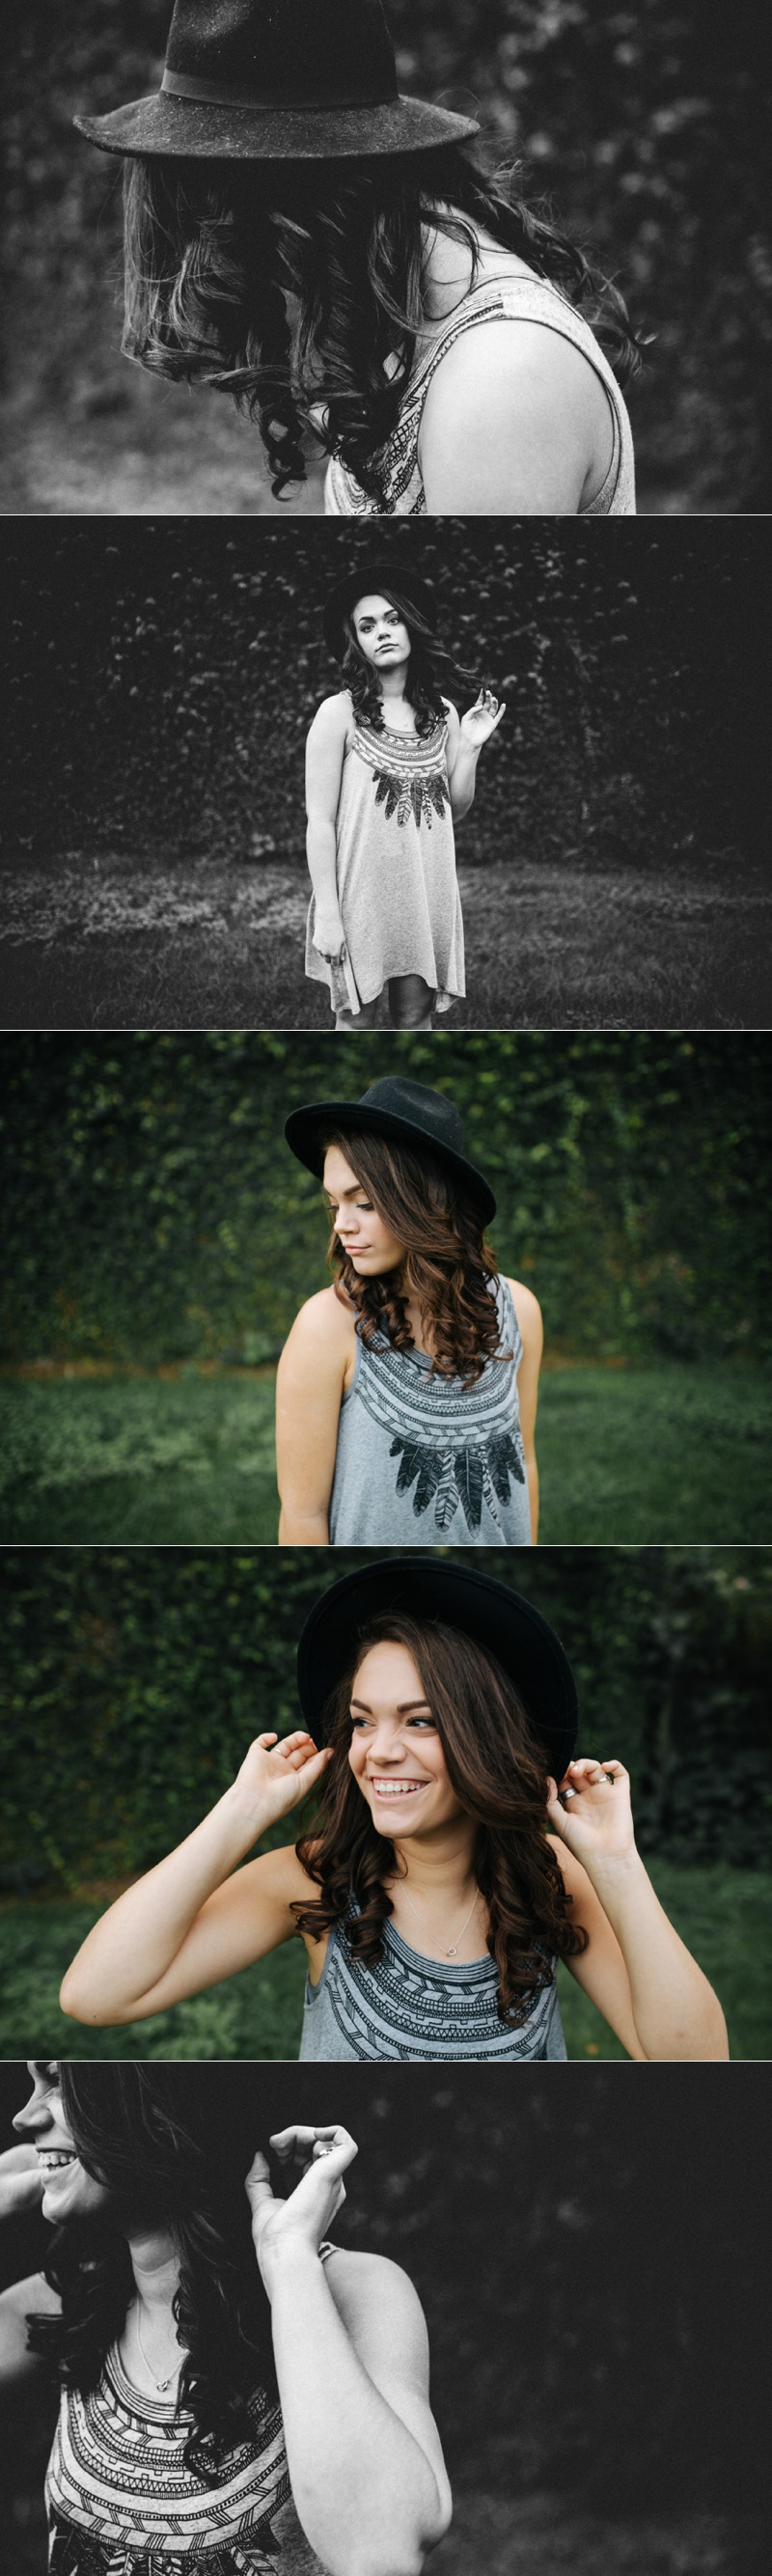 tampa trendy senior portraits-3